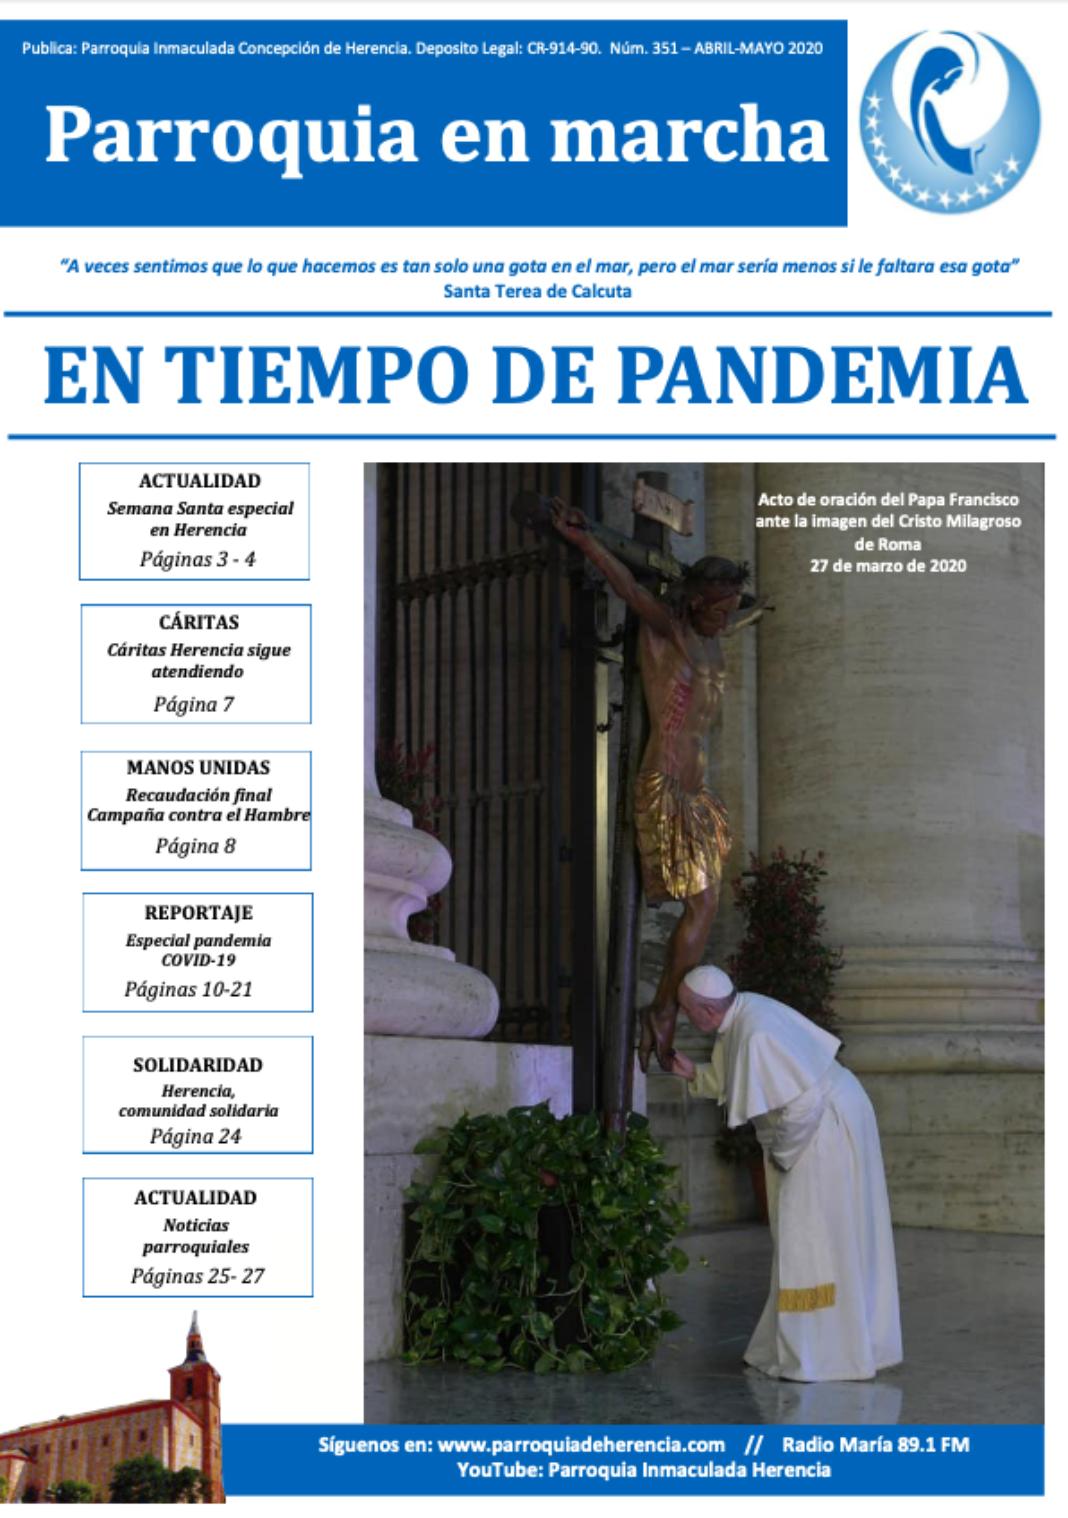 Revista Parroquia en Marcha Especial Pandemia COVID 19 Nº351 abril mayo 2020a 1068x1518 - Parroquia en Marcha, revista decana de Herencia, descargable online en su especial sobre COVID-19